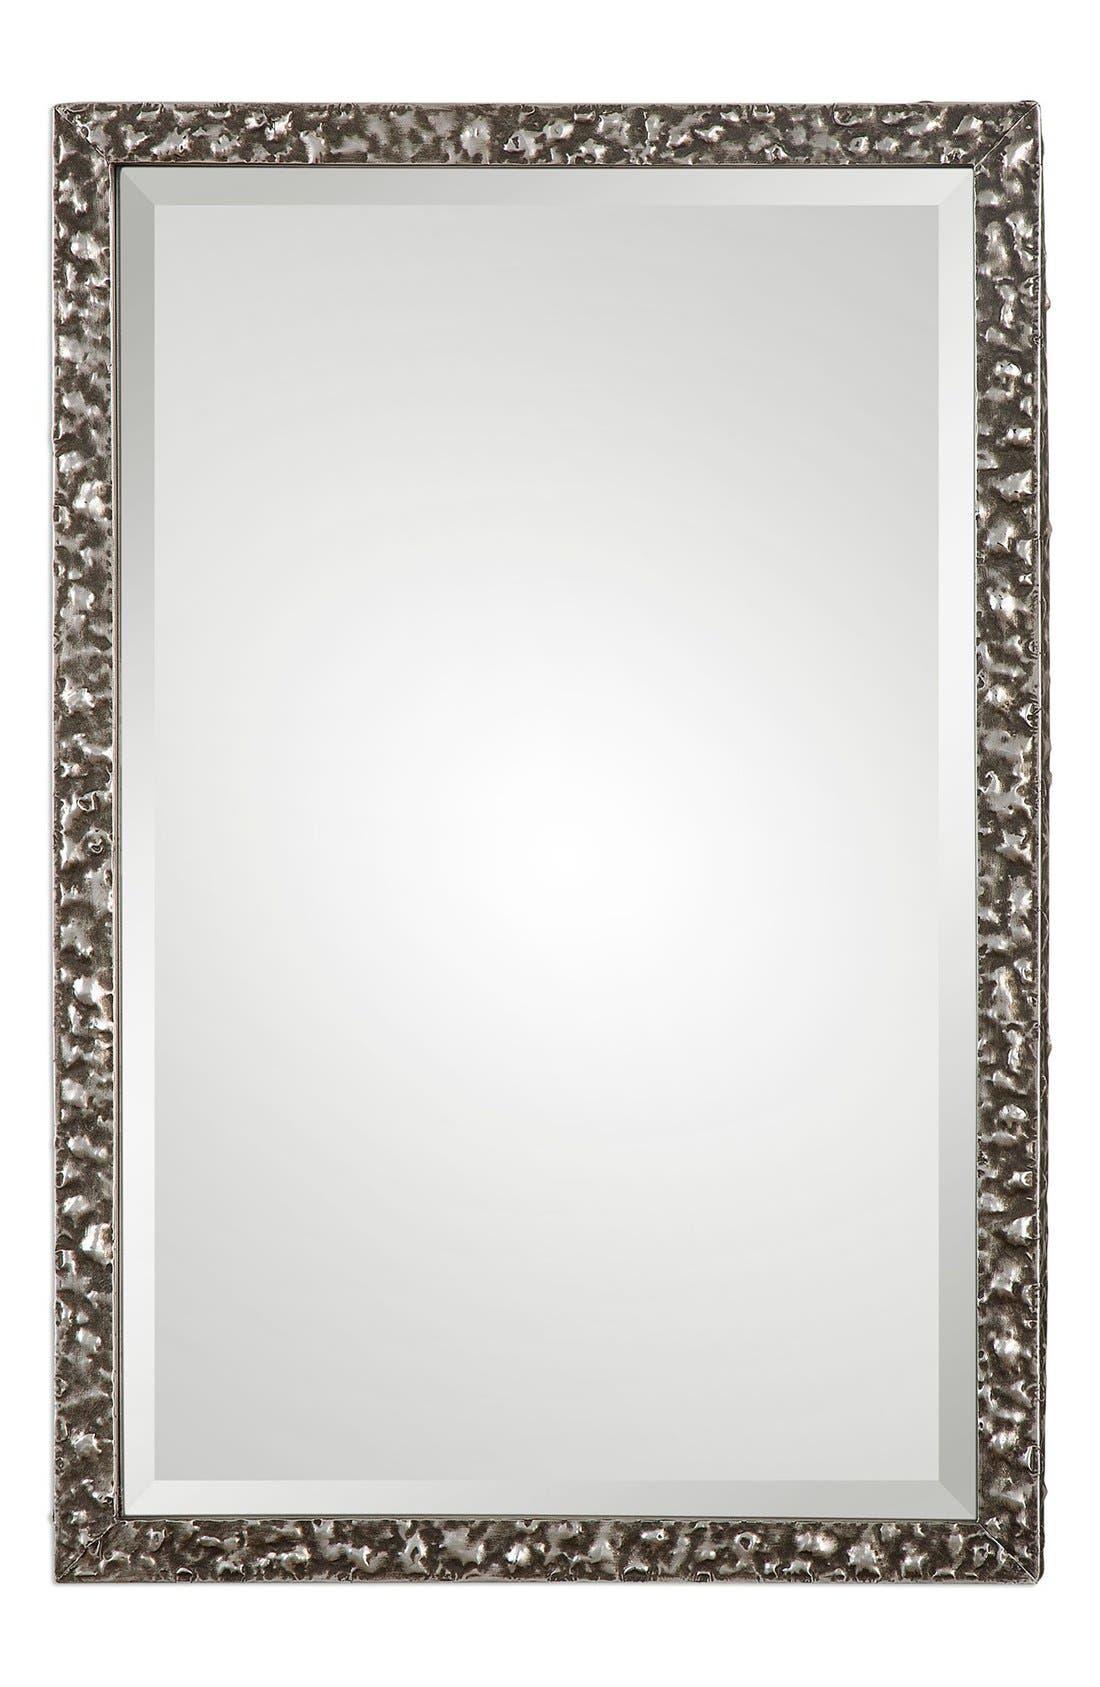 Main Image - Uttermost 'Alshon' Rectangular Wall Mirror